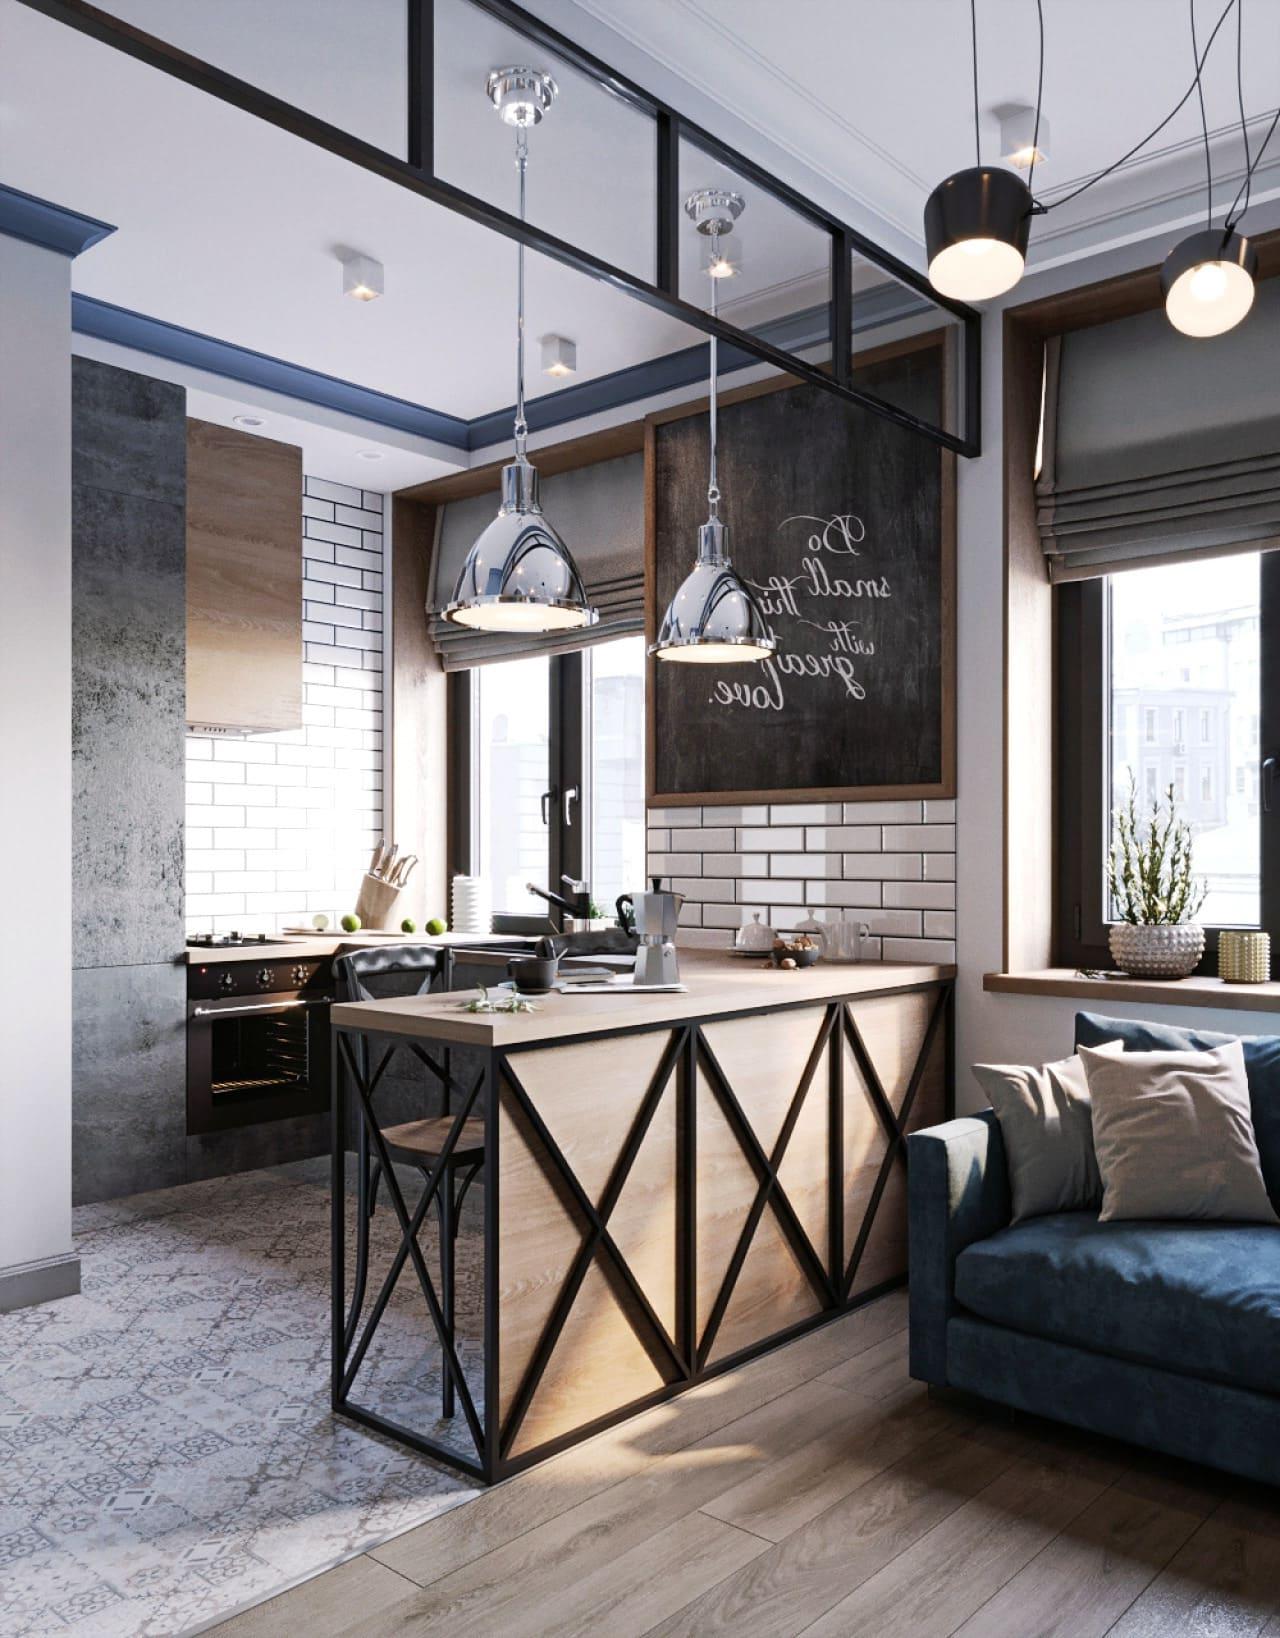 дизайн однокомнатной квартиры фото 36